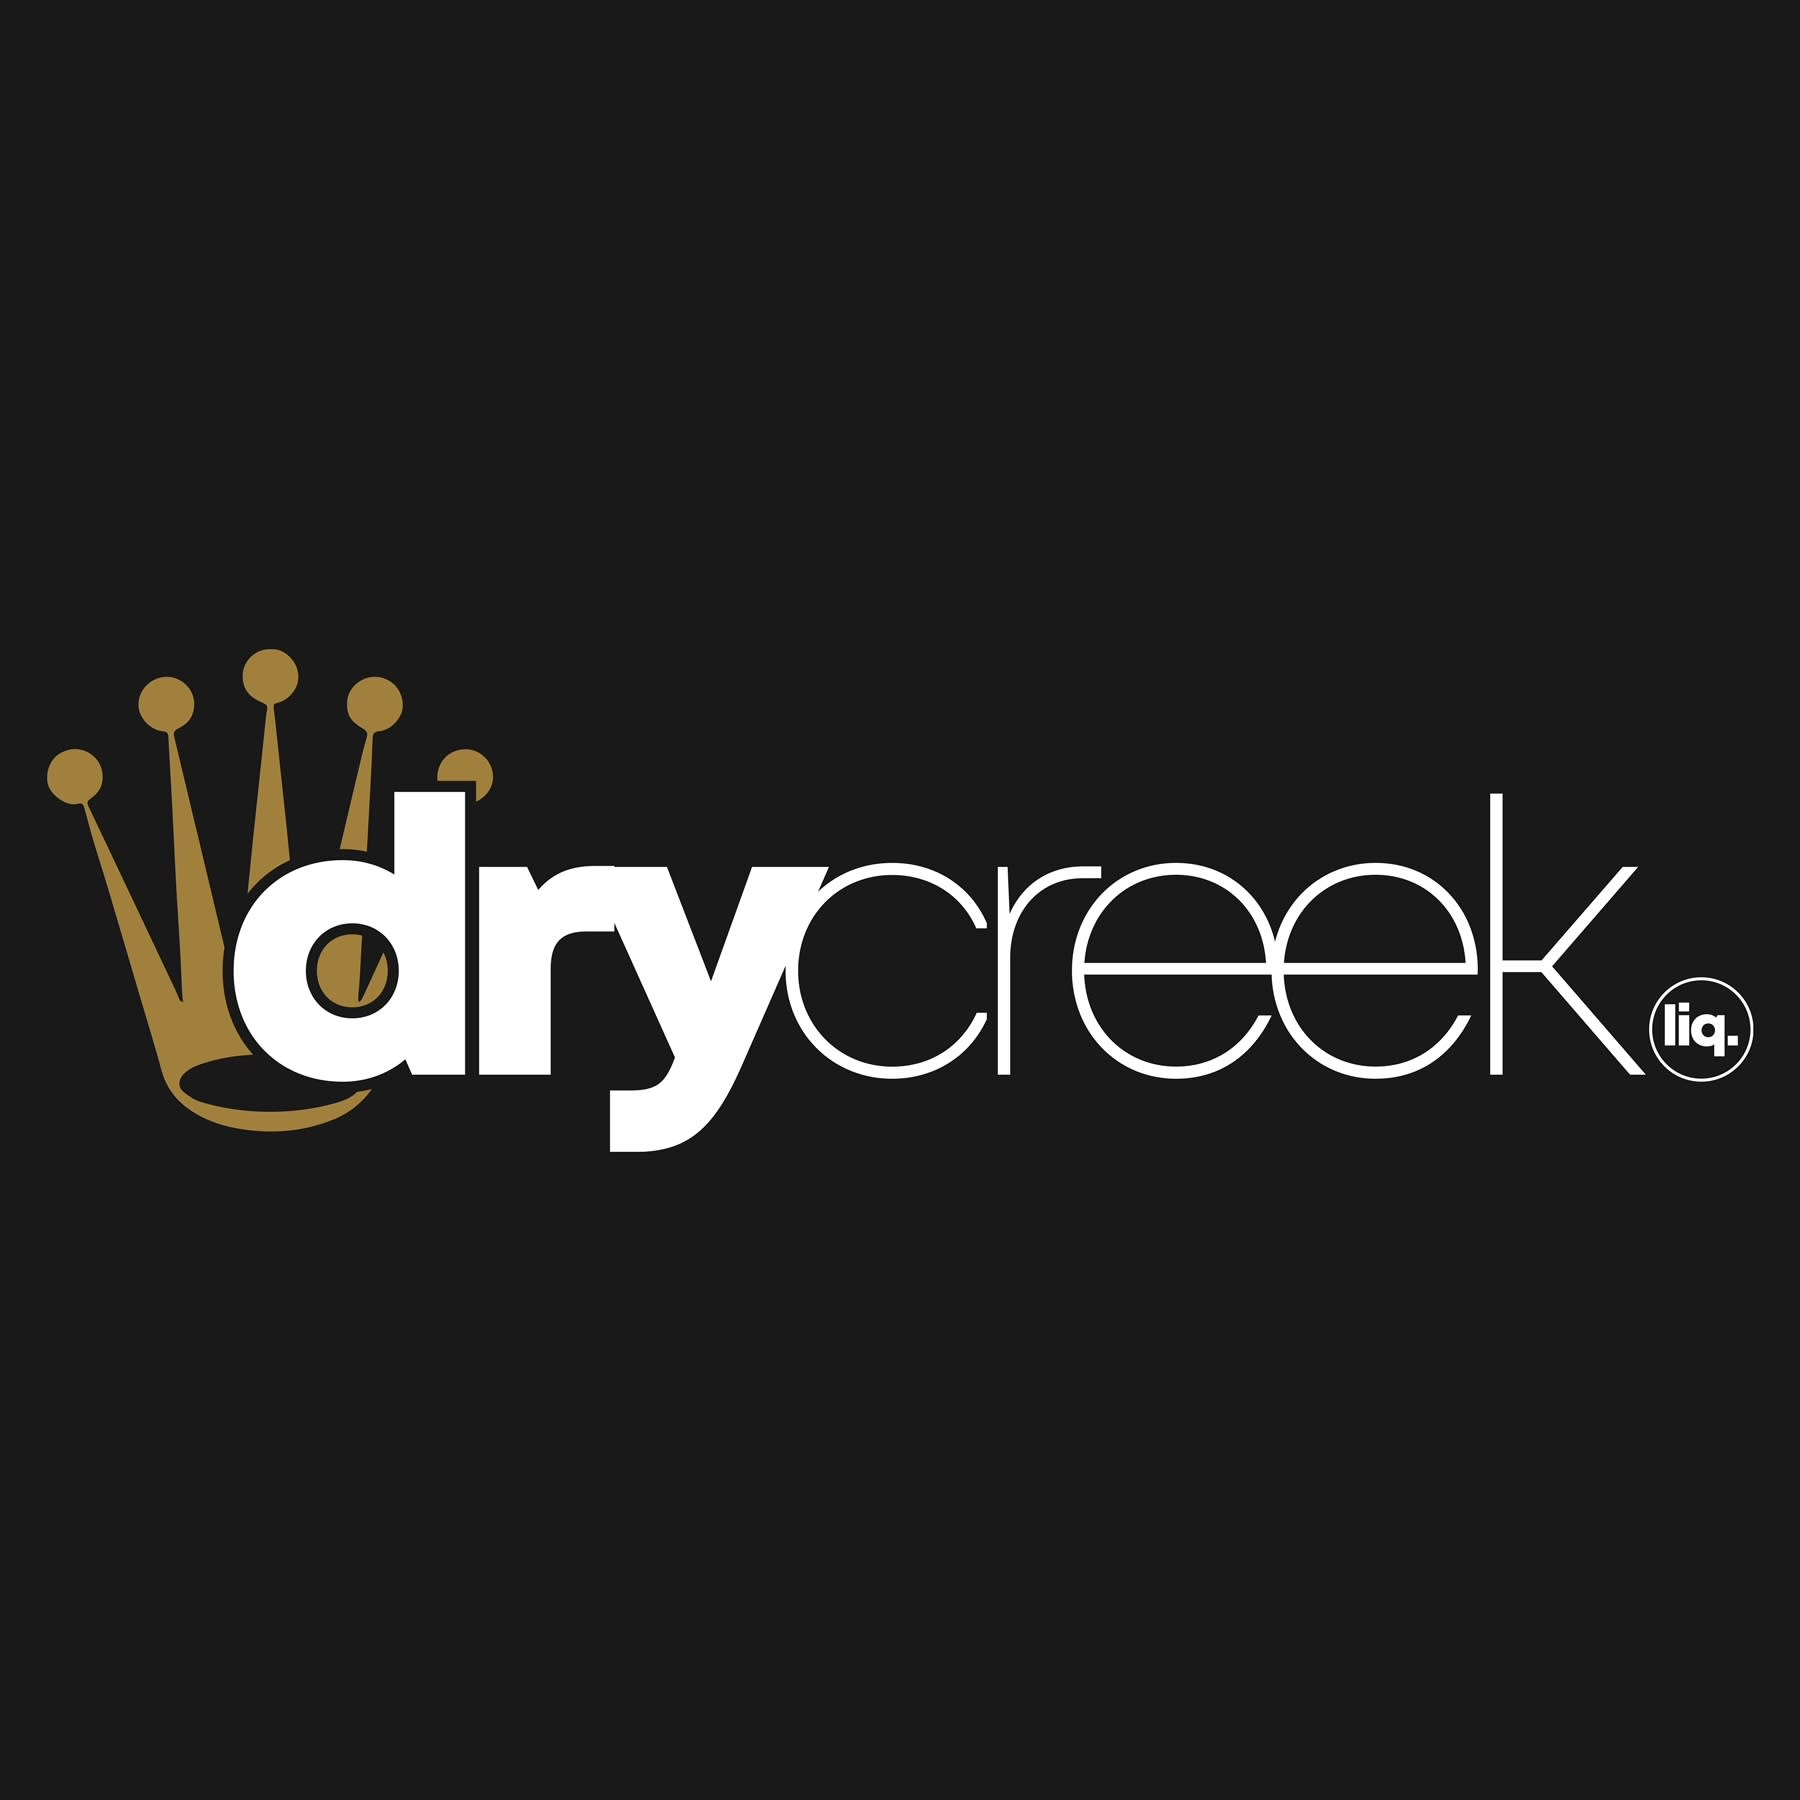 Dry Creek liq. Logo